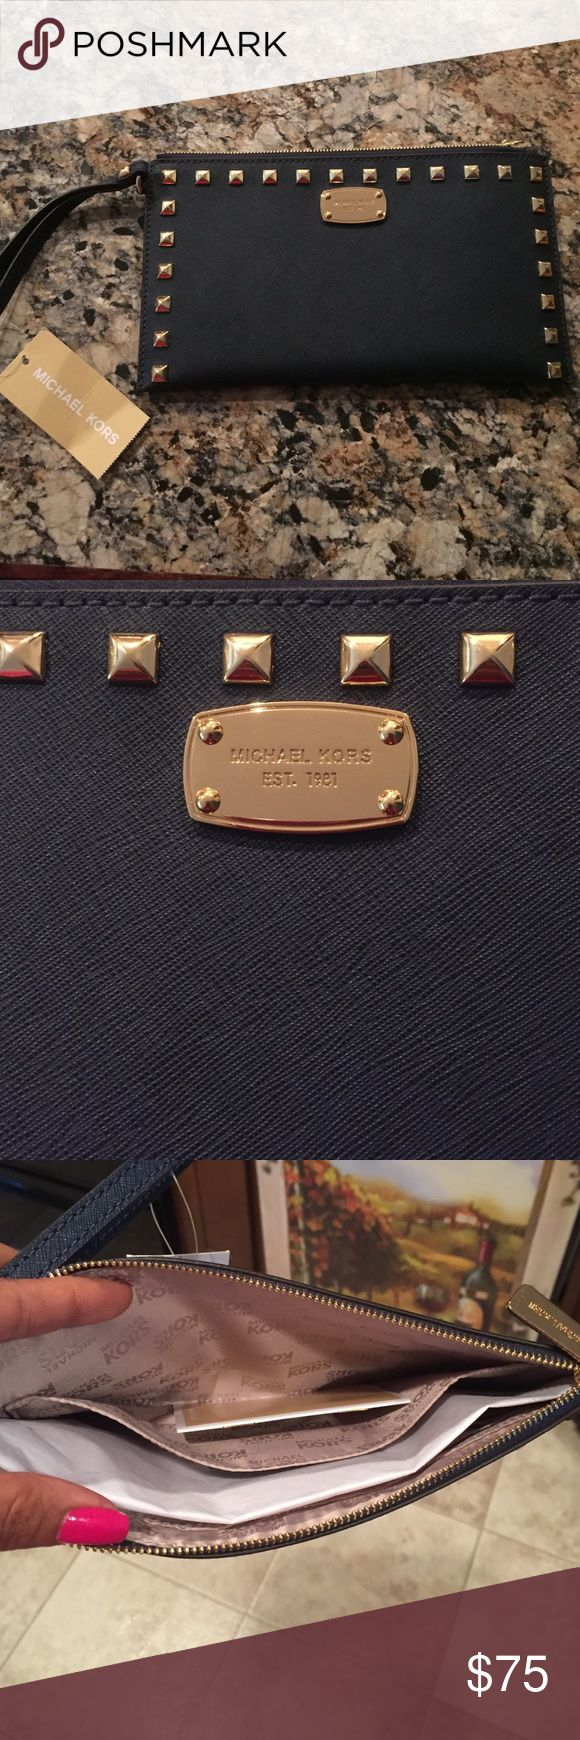 MICHAEL KORS NAVY CLUTCH BRAND NEW! Brand new Michael KORS Navy clutch New with tags never been used!  COLOR IS NAVY BLUE Michael Kors Bags Clutches & Wristlets